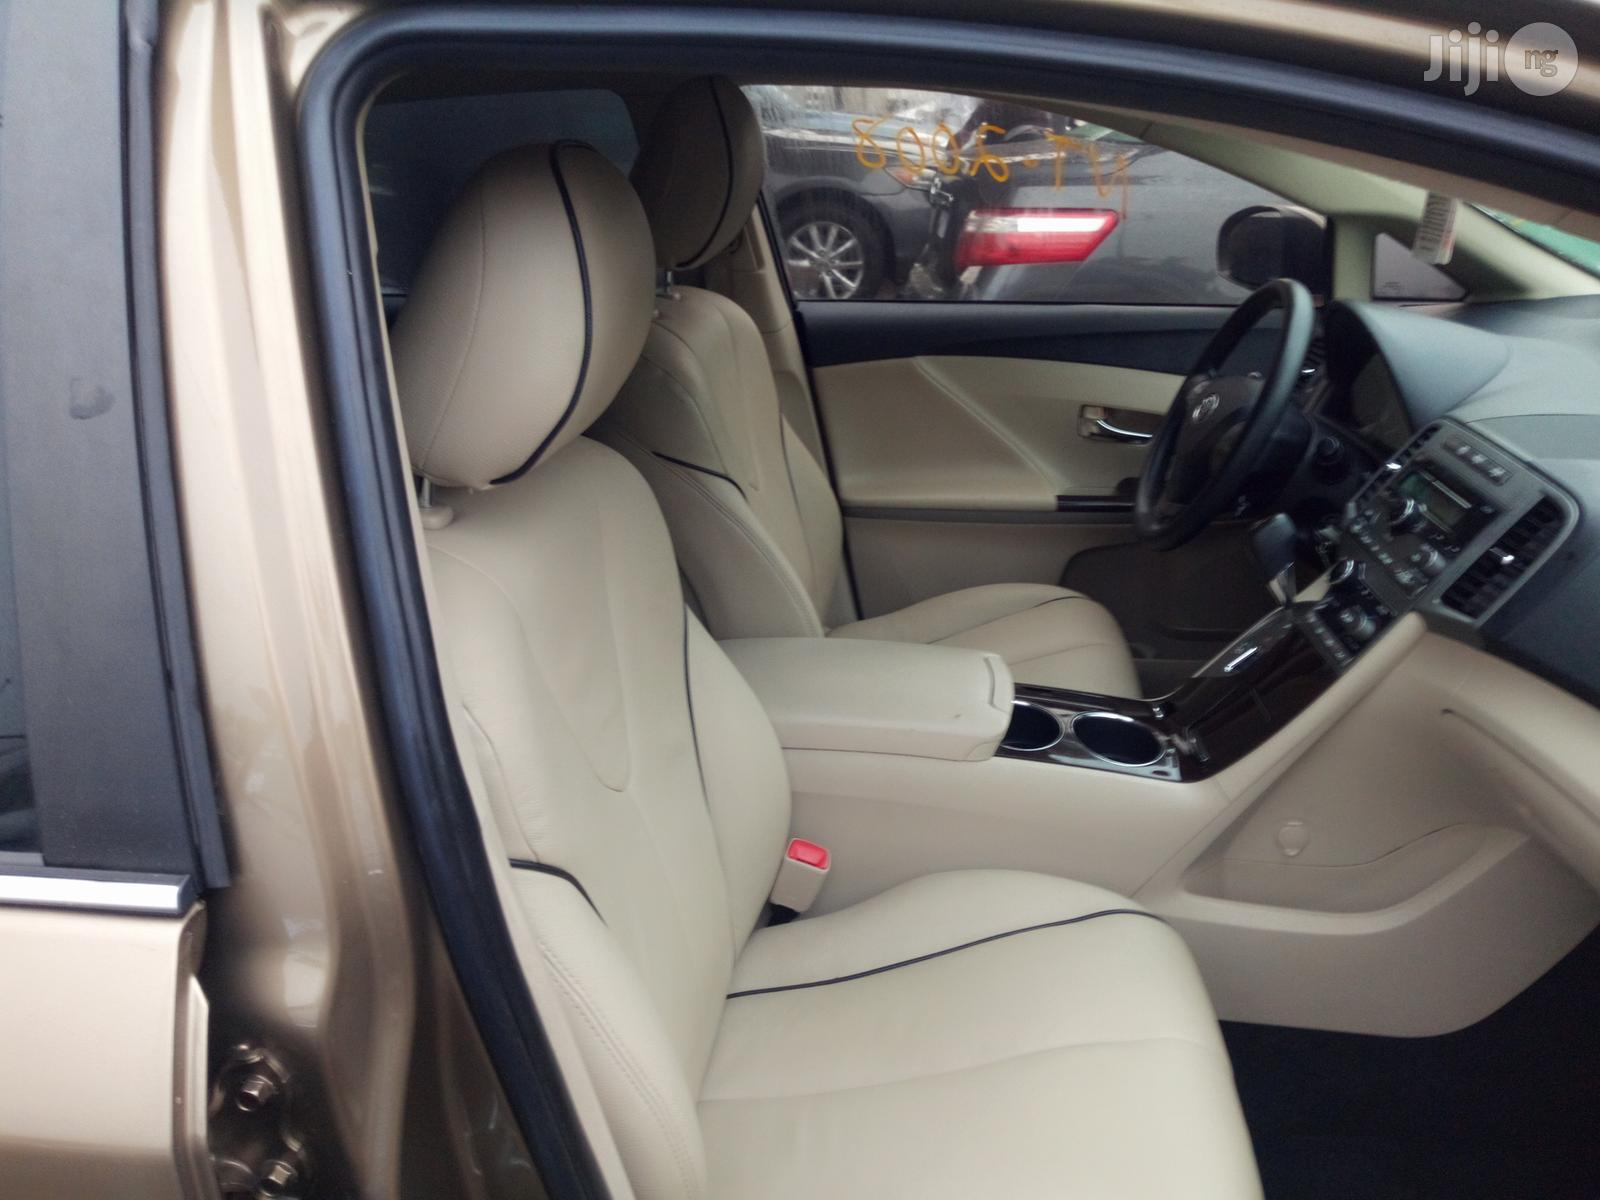 Toyota Venza 2009 Brown | Cars for sale in Amuwo-Odofin, Lagos State, Nigeria